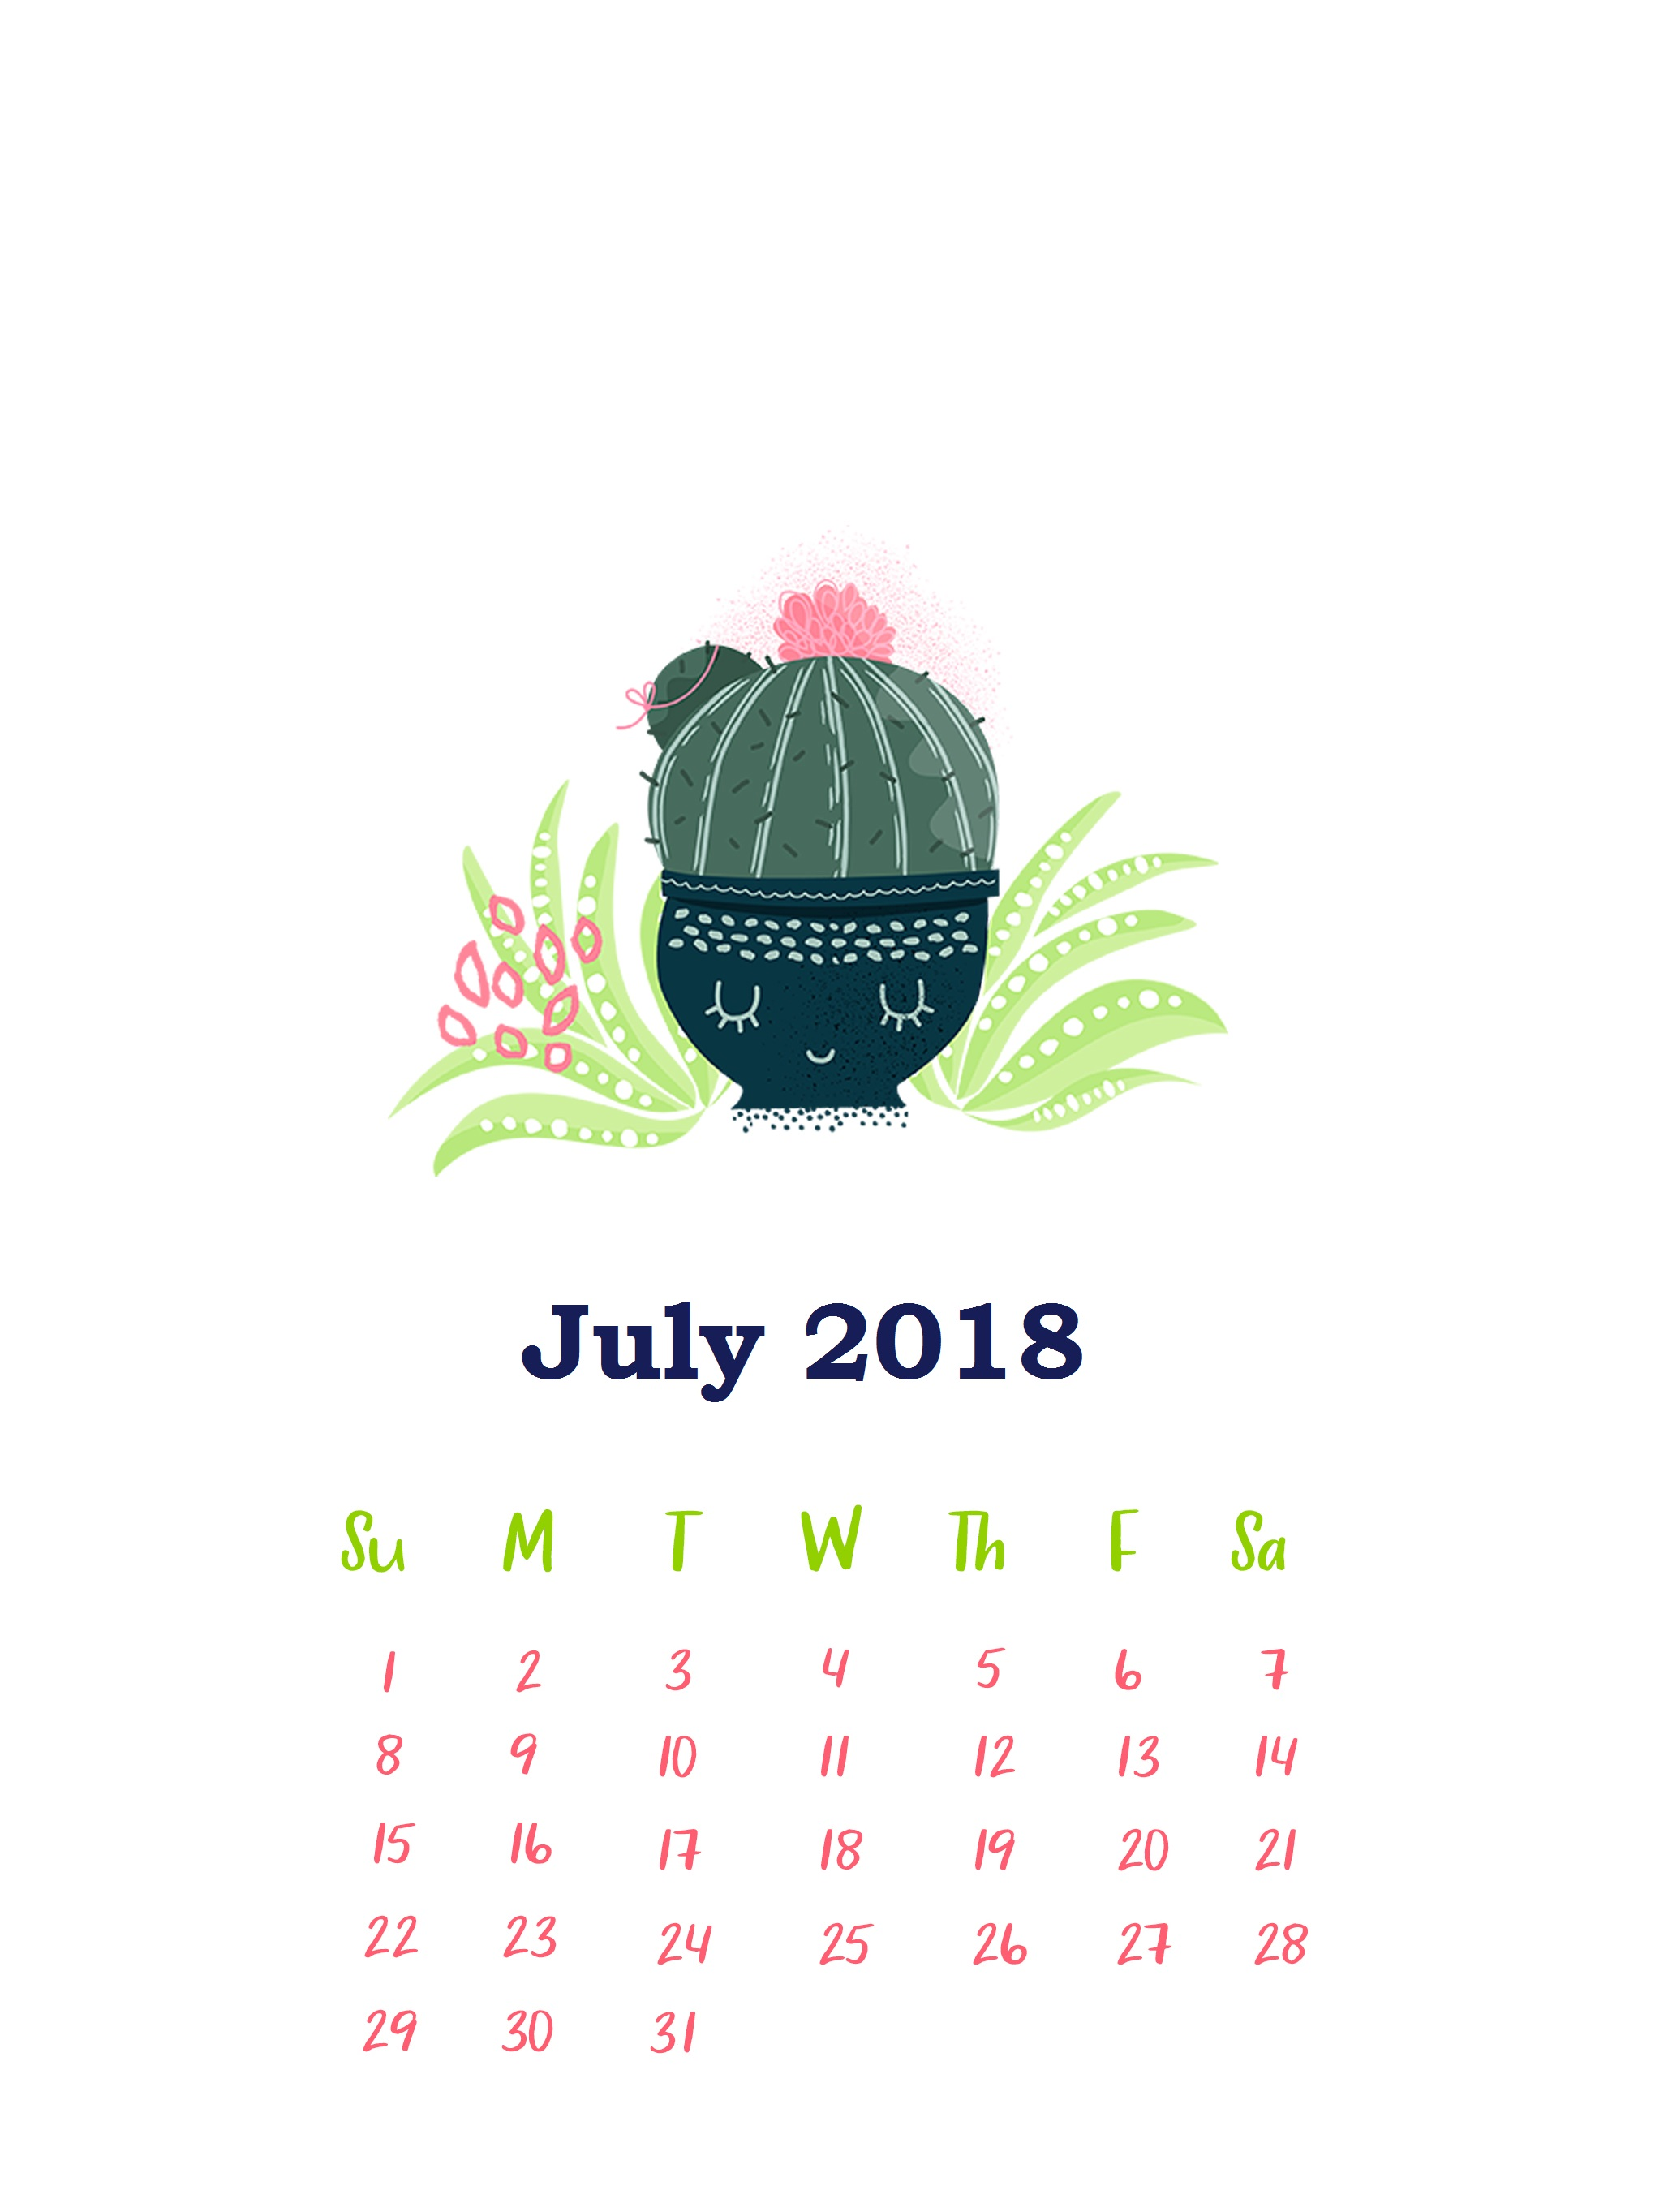 Download July 2018 iPhone Calendar Wallpapers Calendar 2018 2056x2726